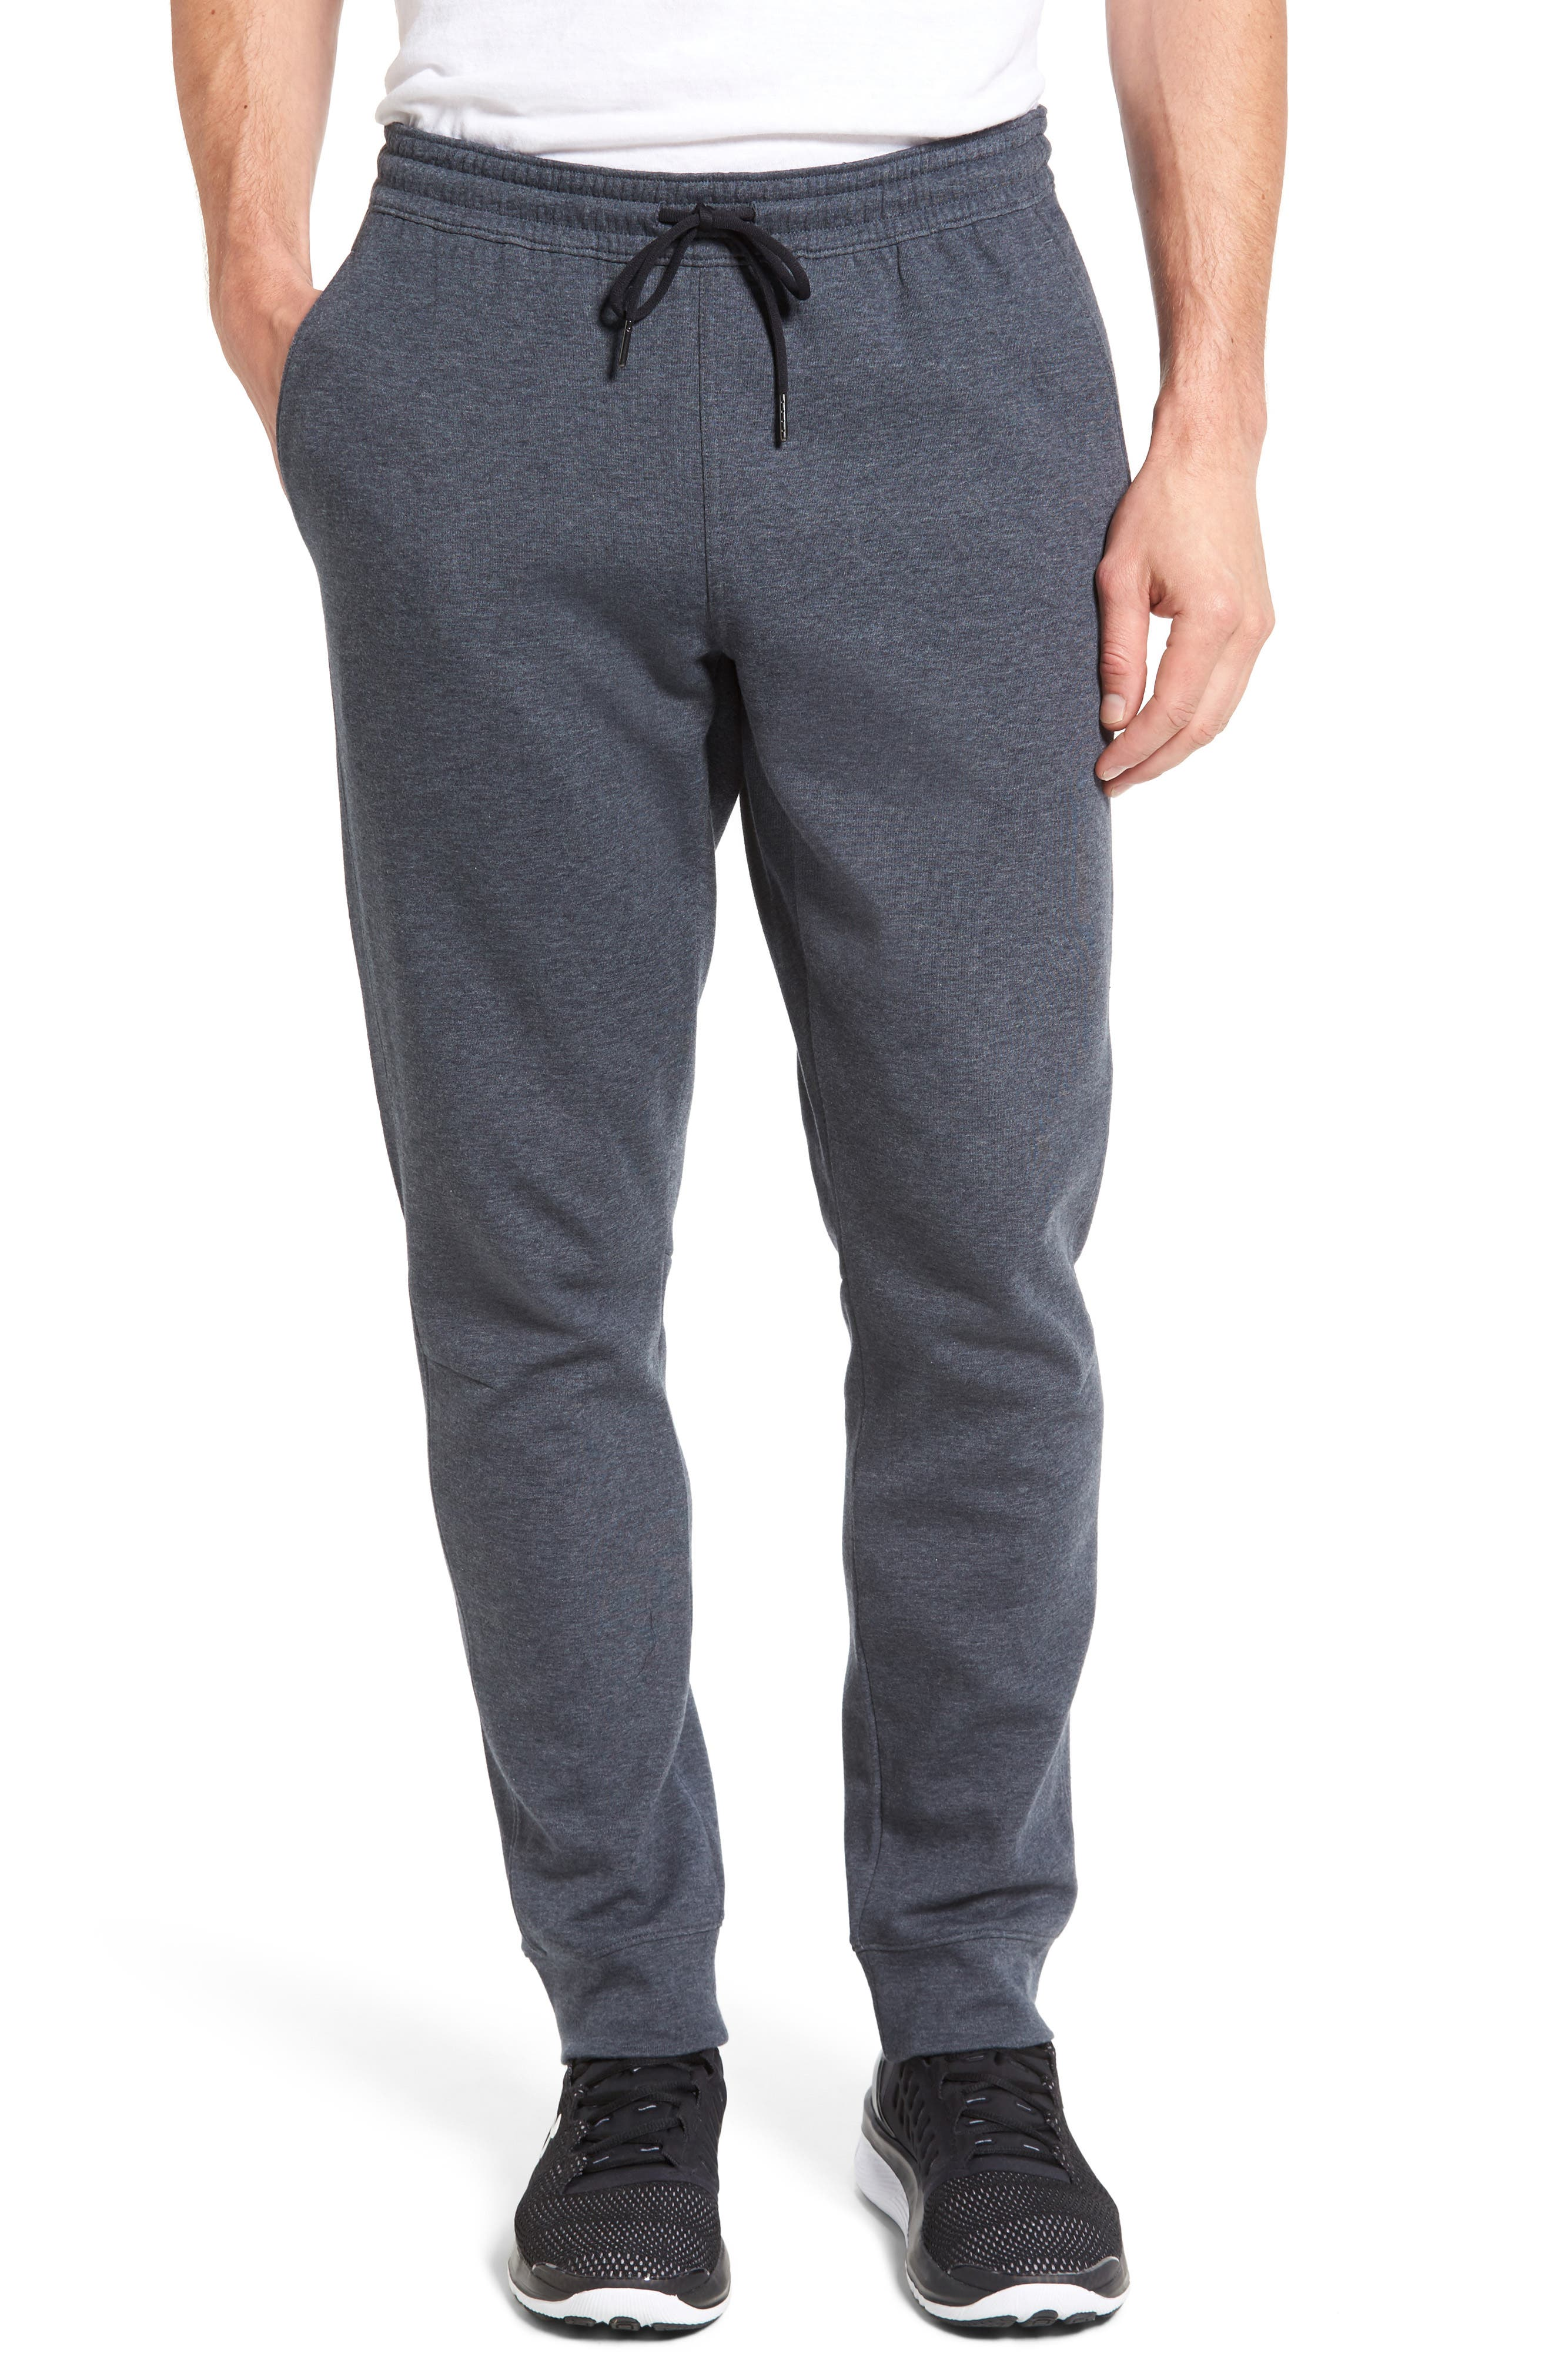 Alternate Image 1 Selected - Zella Knit Jogger Pants